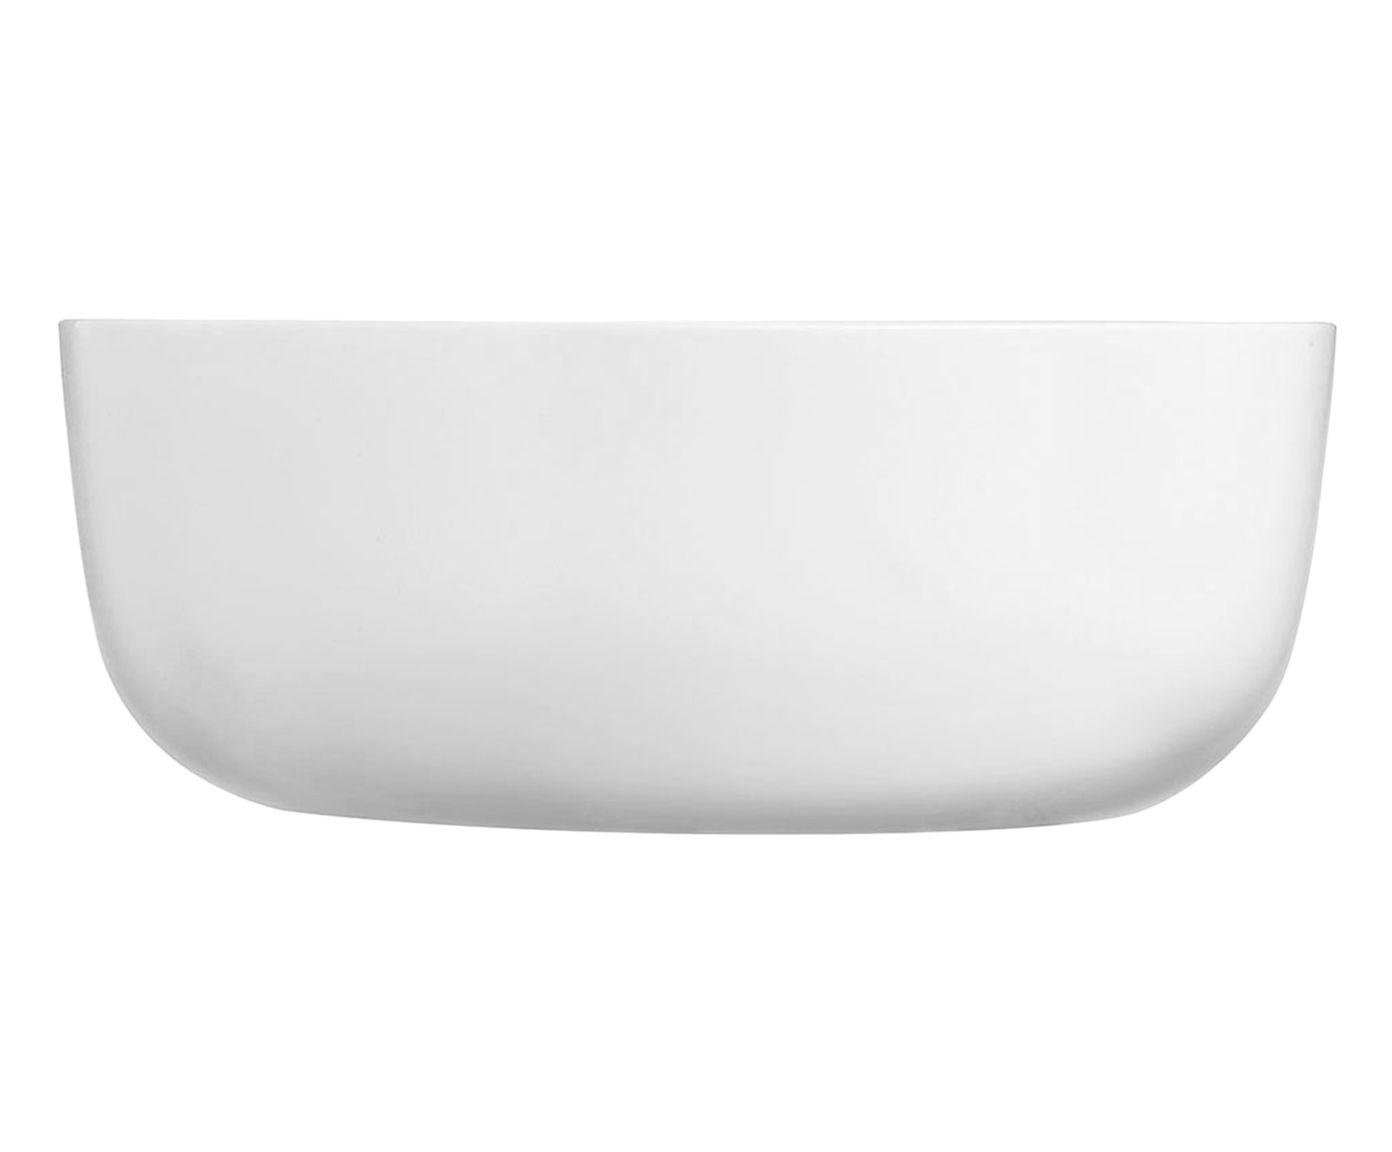 Assadeira Diwali Branca - 17,8X6,8X17,8cm   Westwing.com.br